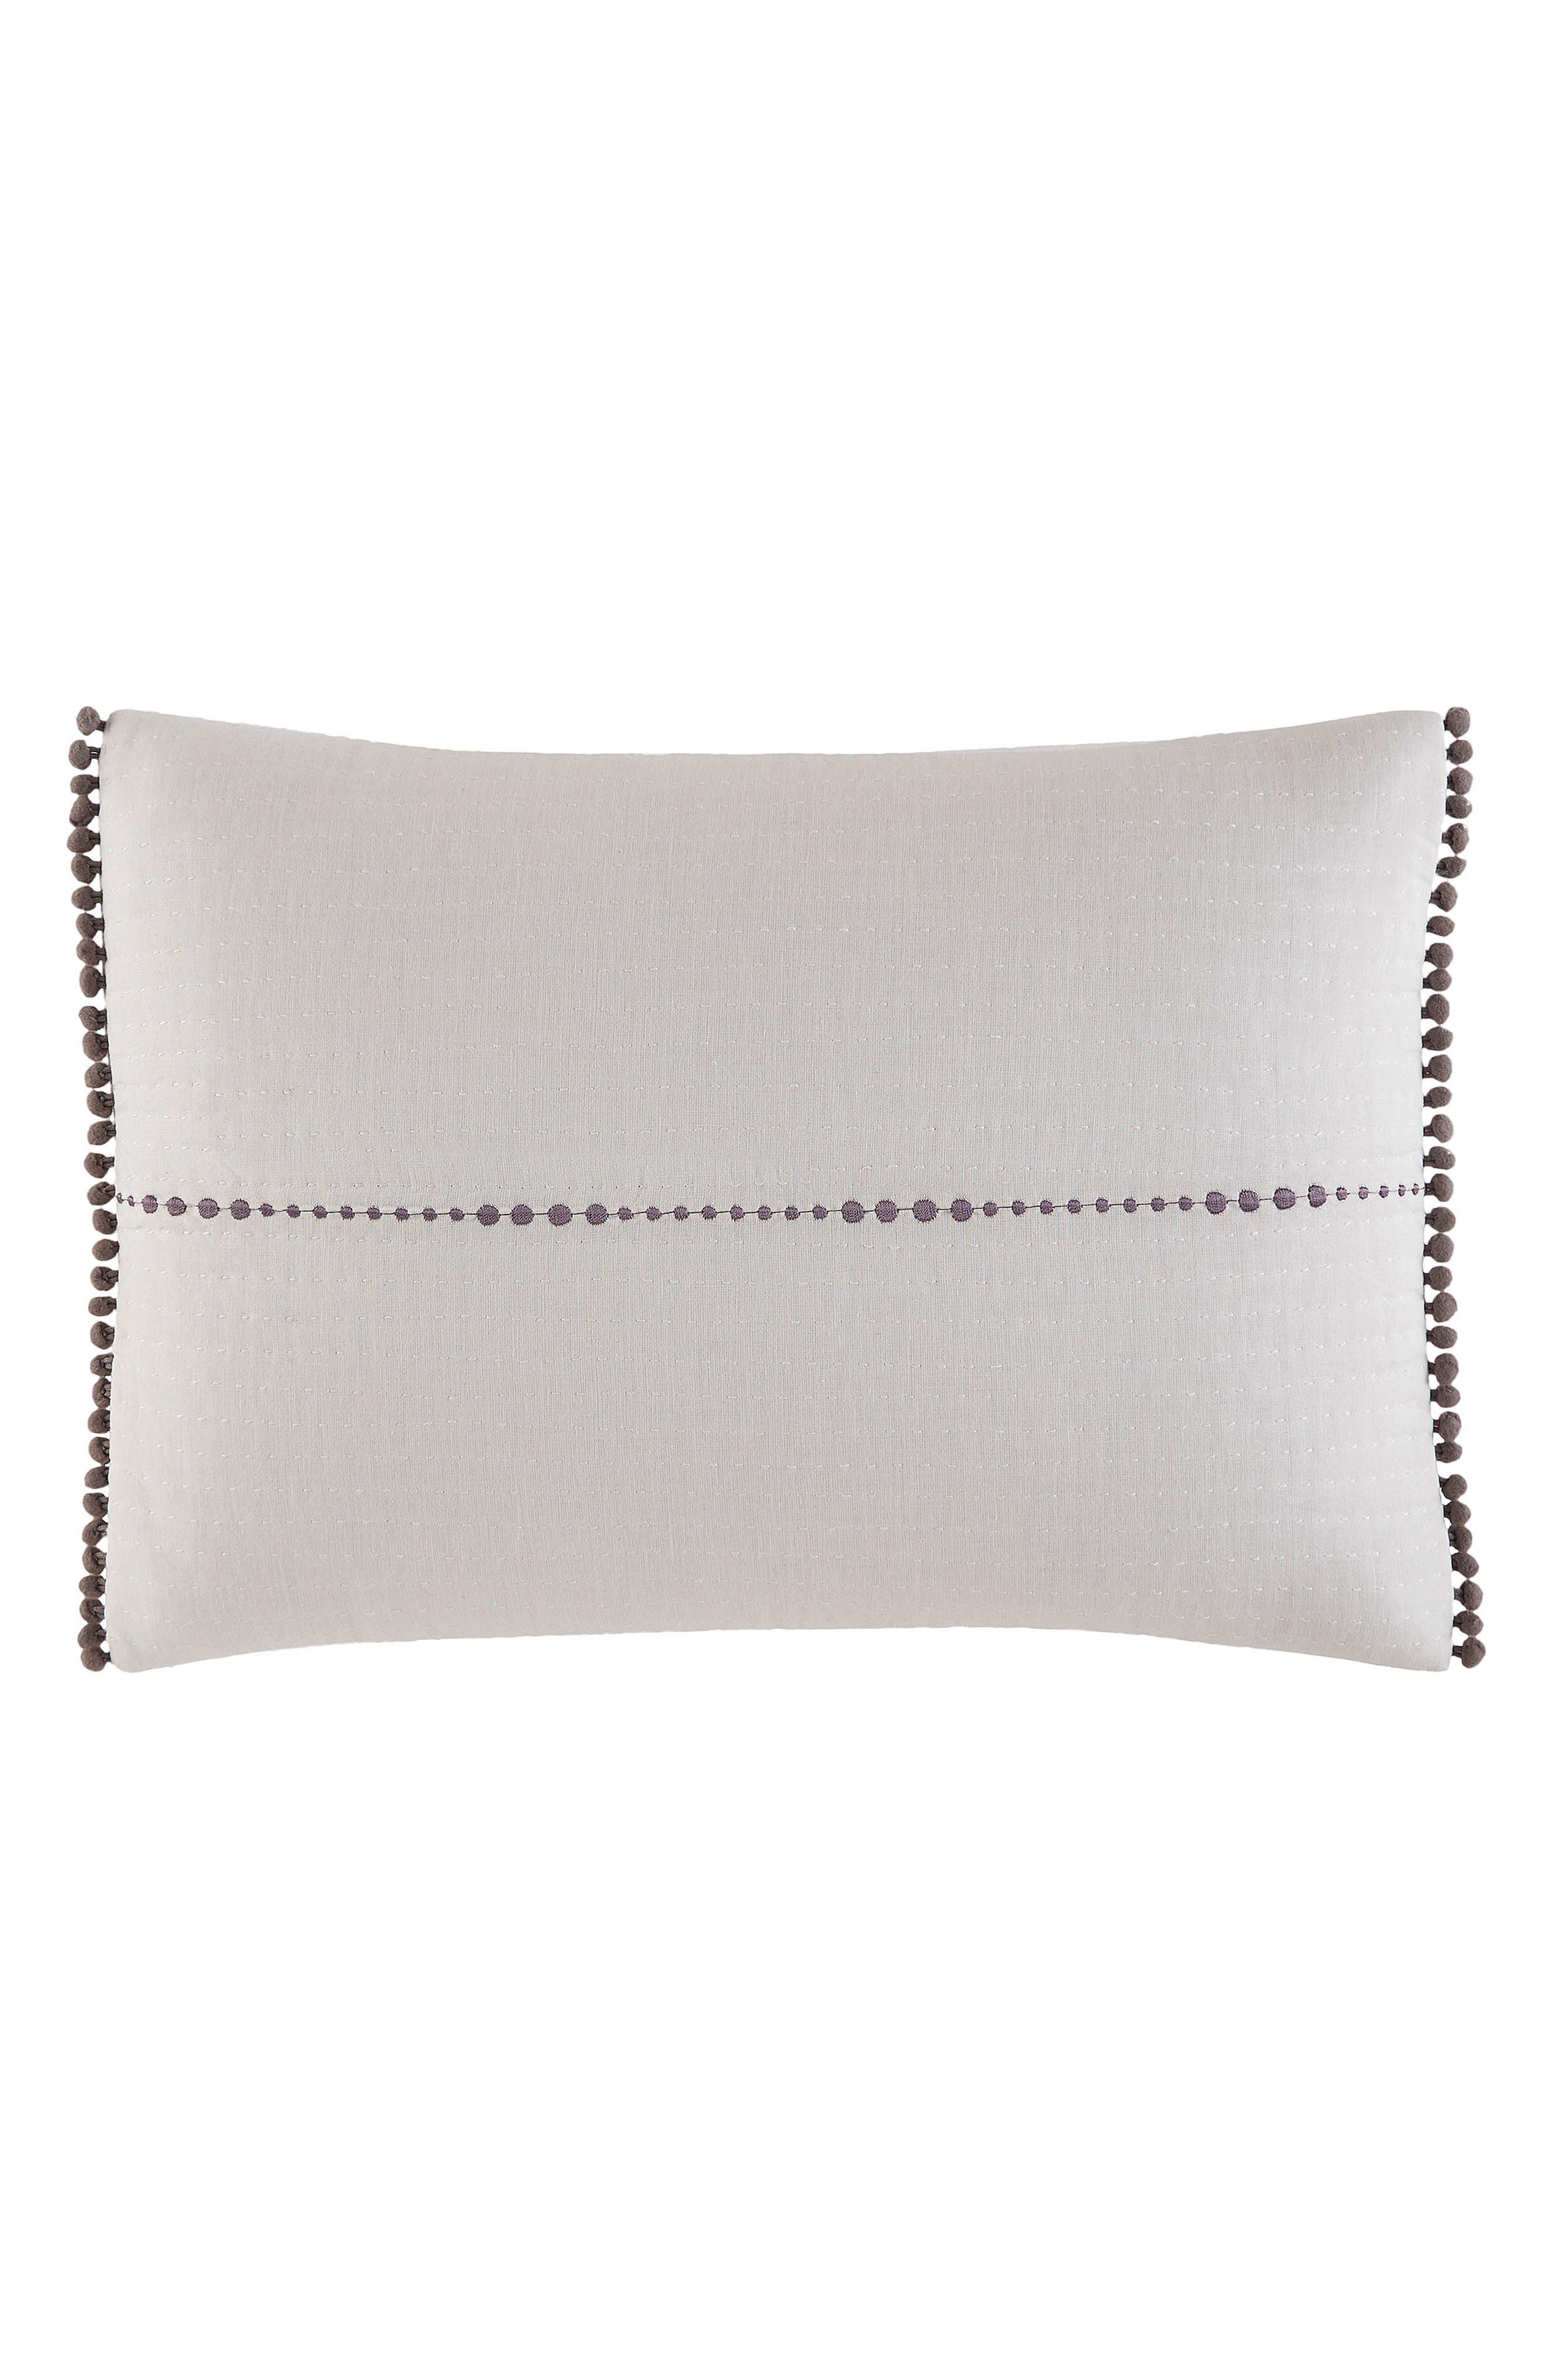 Main Image - ED Ellen DeGeneres Greystone Accent Pillow